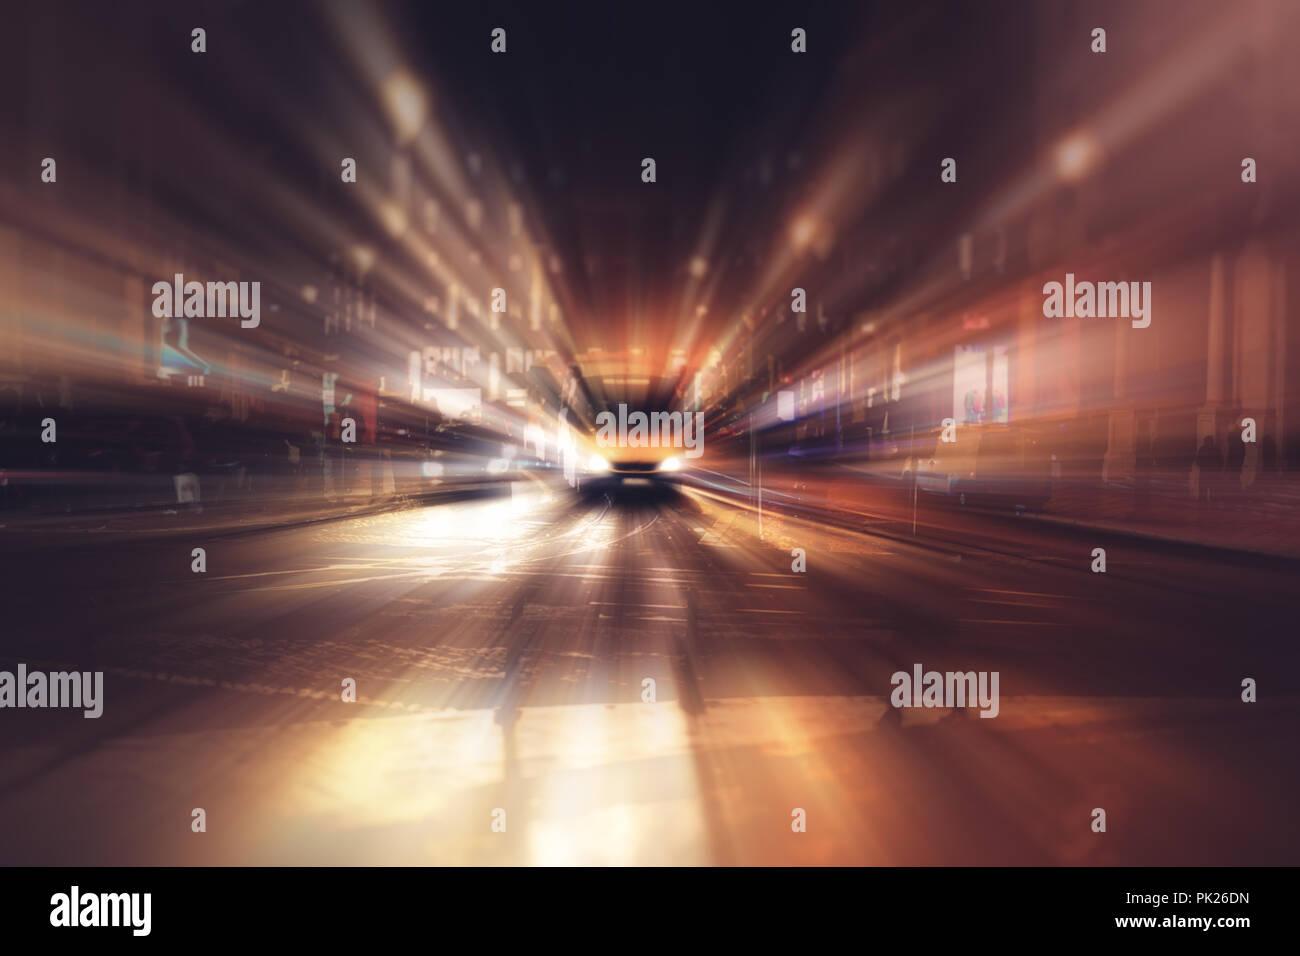 Blurry Illumination And Night Lights Car Traffic Motion Blur The Speed Moving Stock Photo Alamy